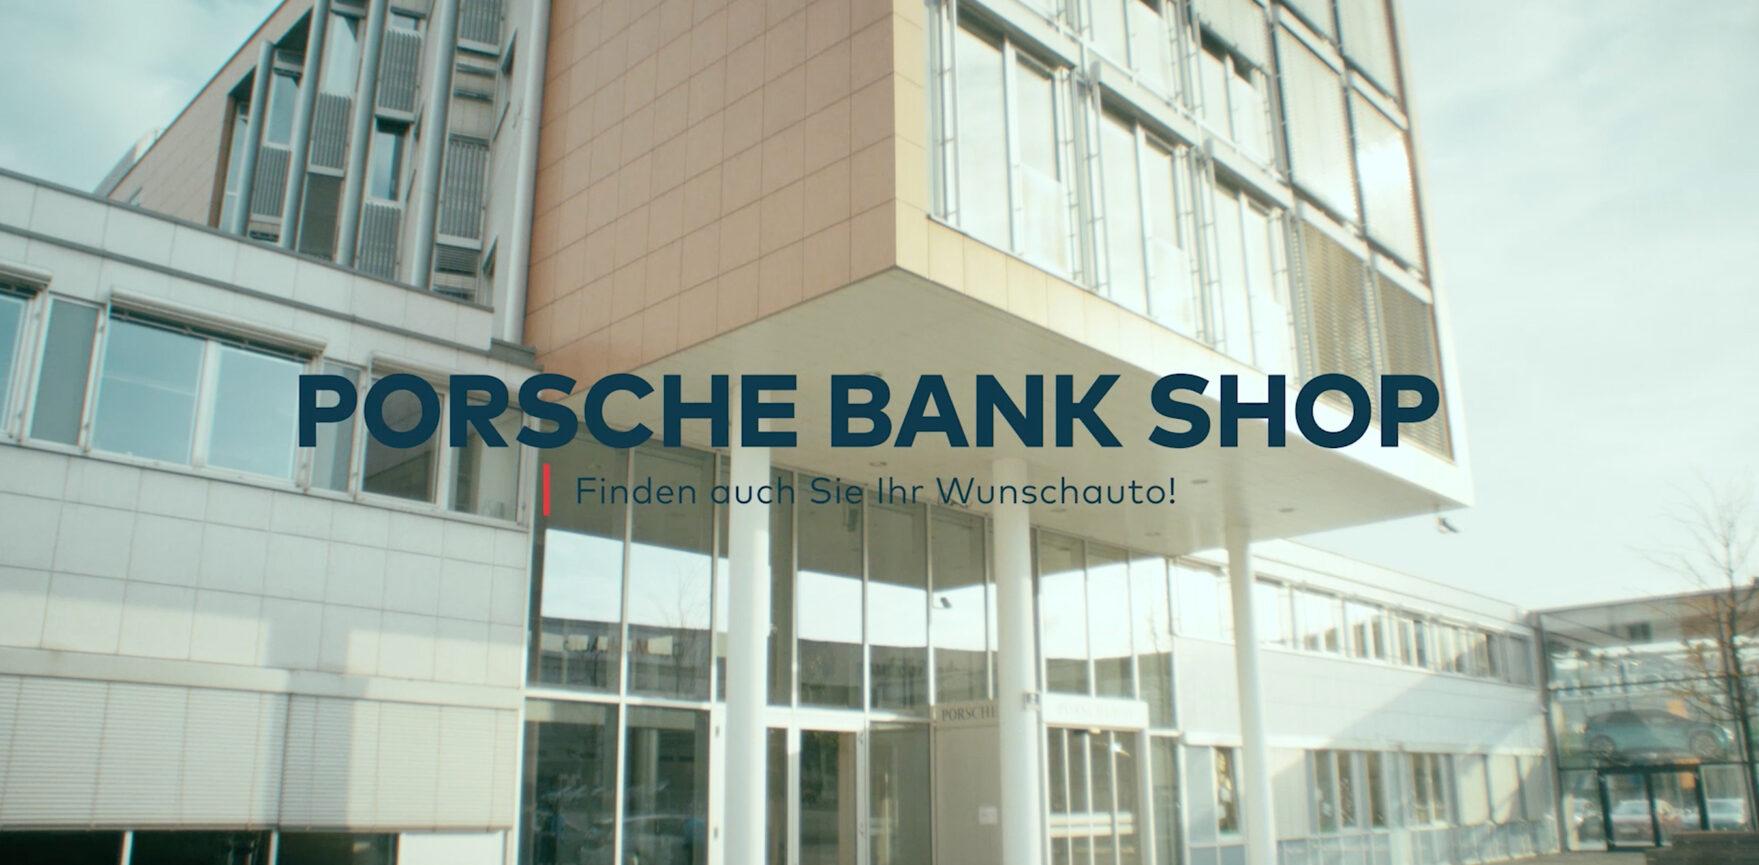 Porsche Bank Shop Film Intro